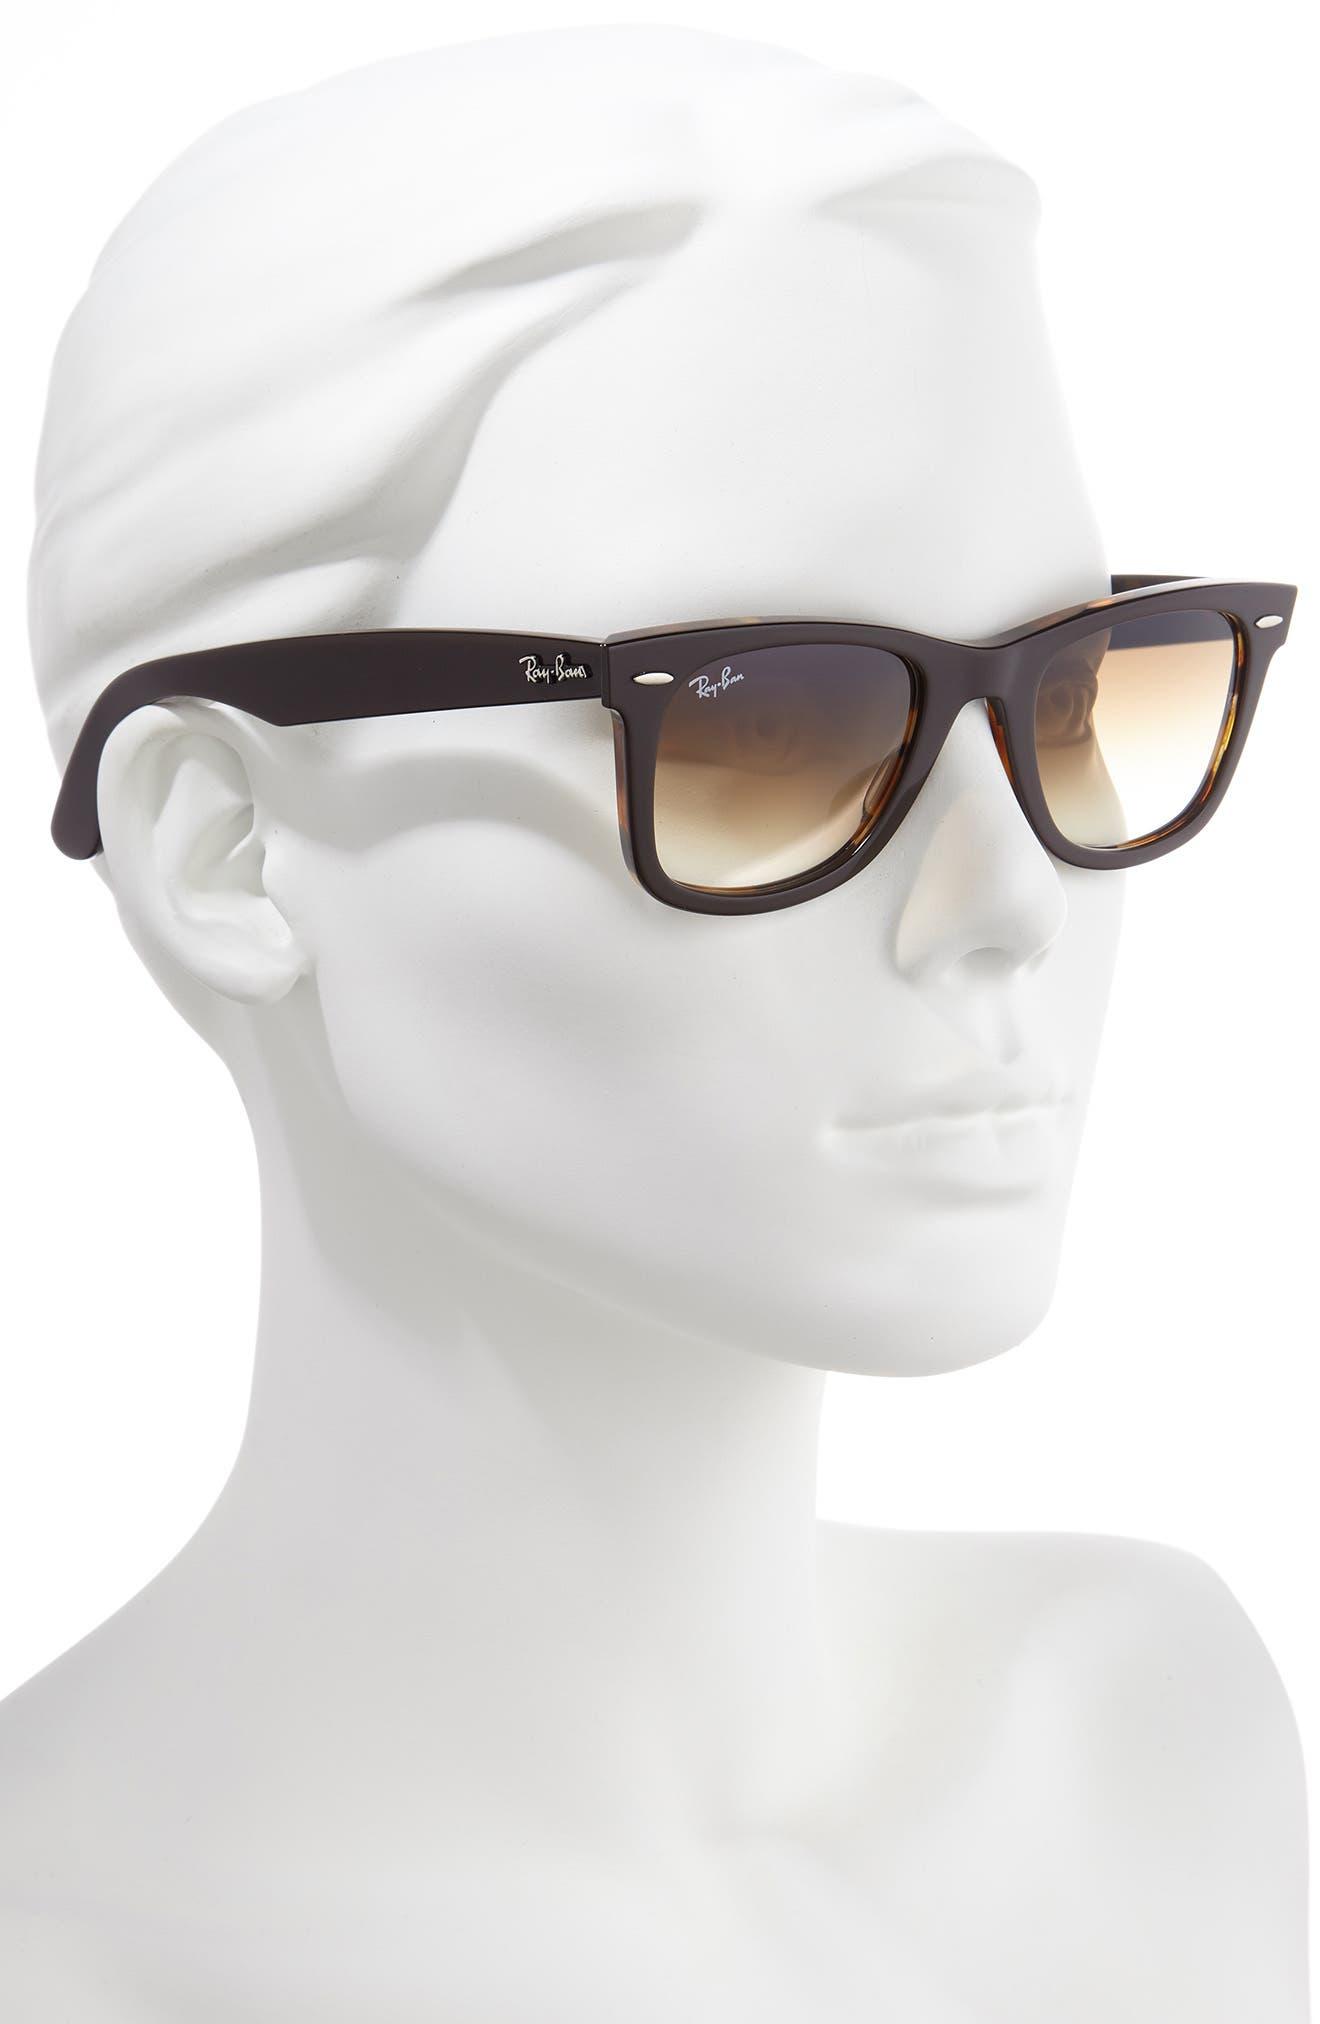 c42e5050bf083 Ray-Ban Wayfarer Sunglasses